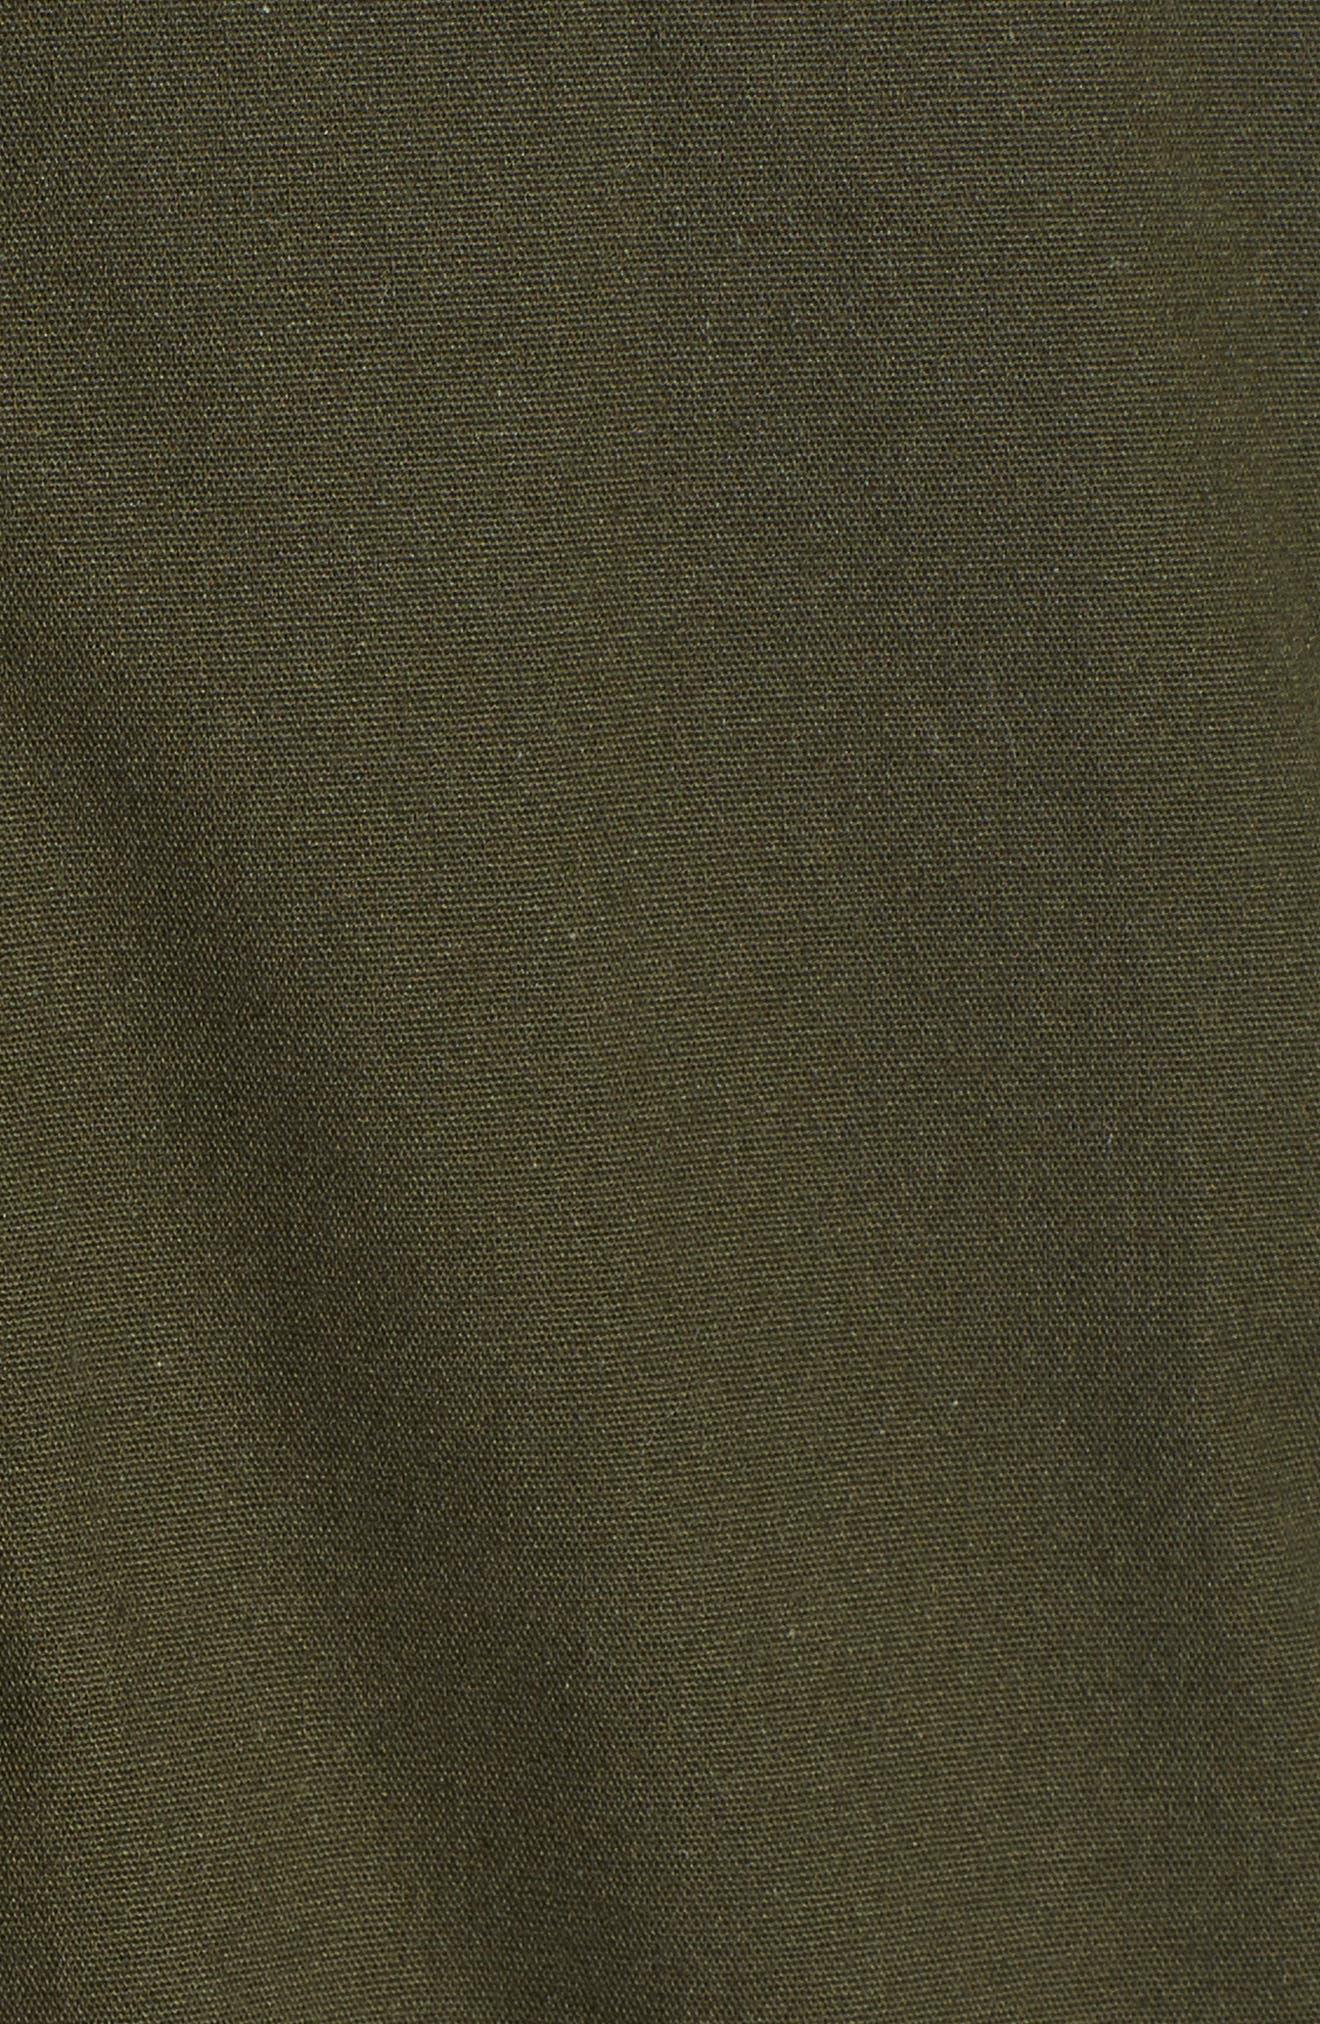 Convertible Down 3-in-1 Maternity Jacket,                             Alternate thumbnail 7, color,                             Khaki Green